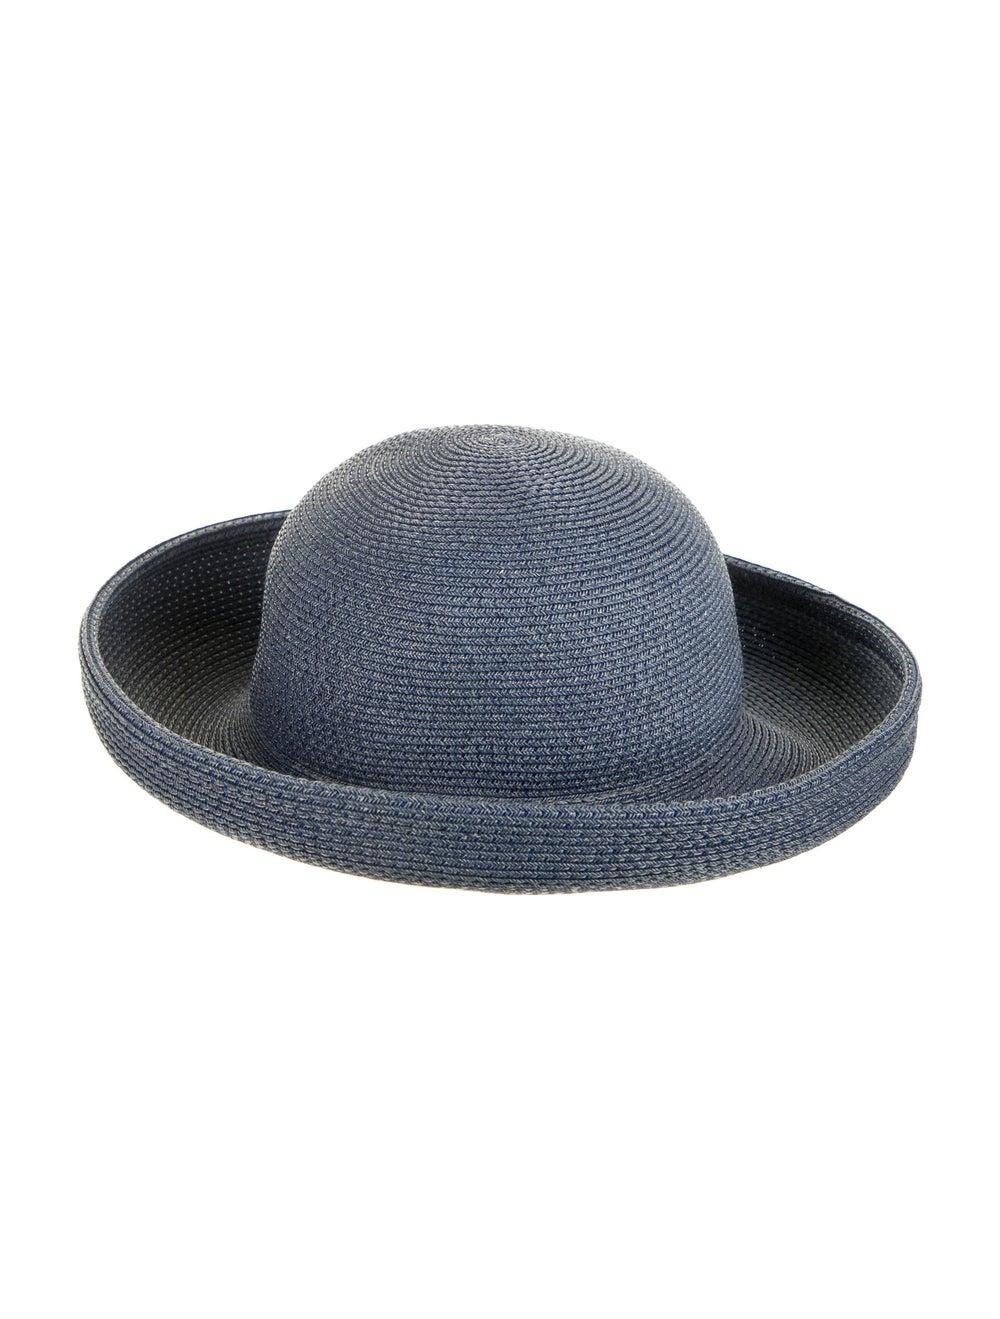 Eric Javits Wide Brim Hat Blue - image 1